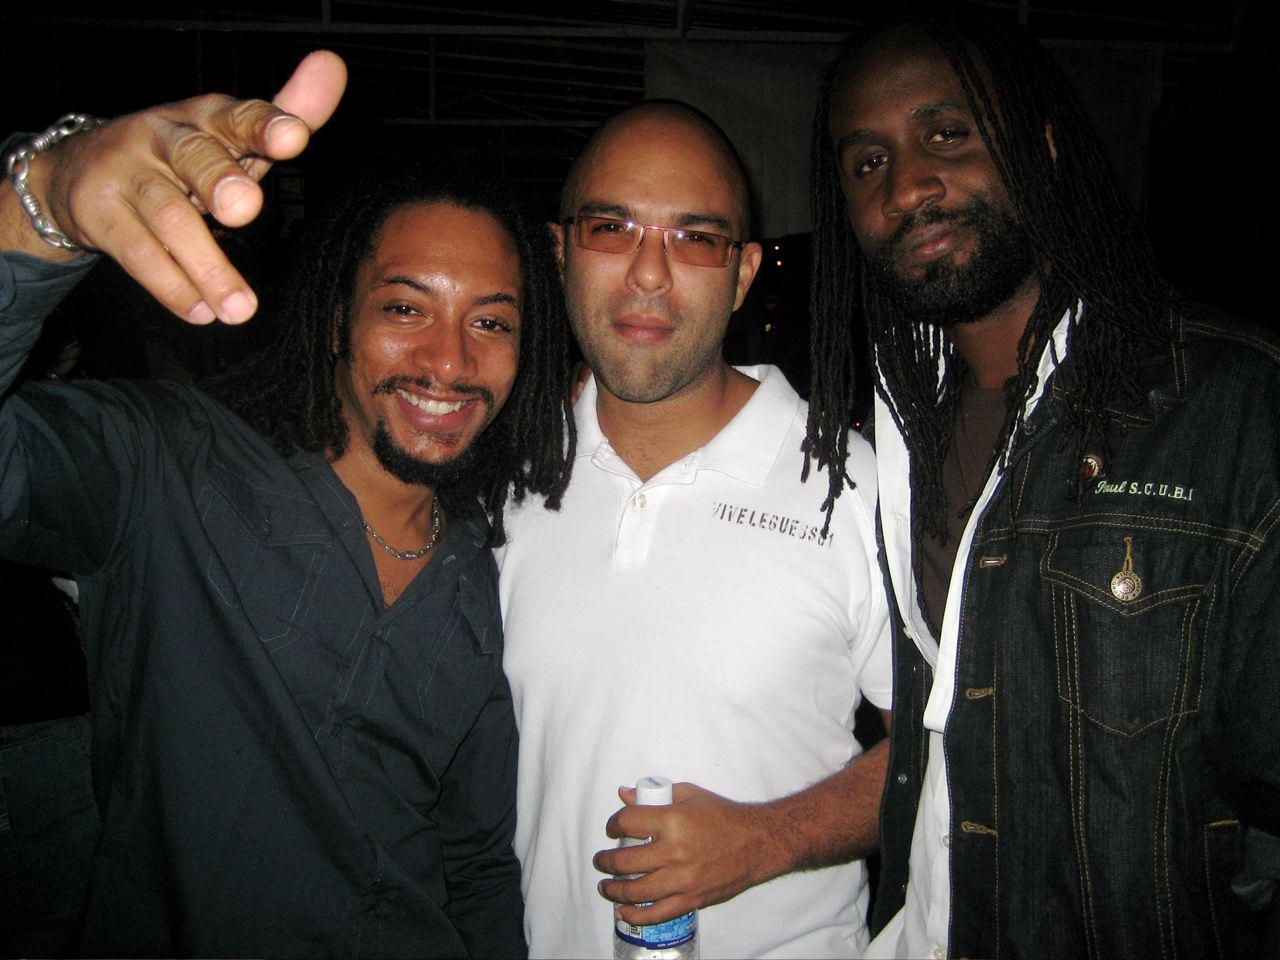 Rootz Crew: Colin, Jeffrey, S.C.U.B.I.